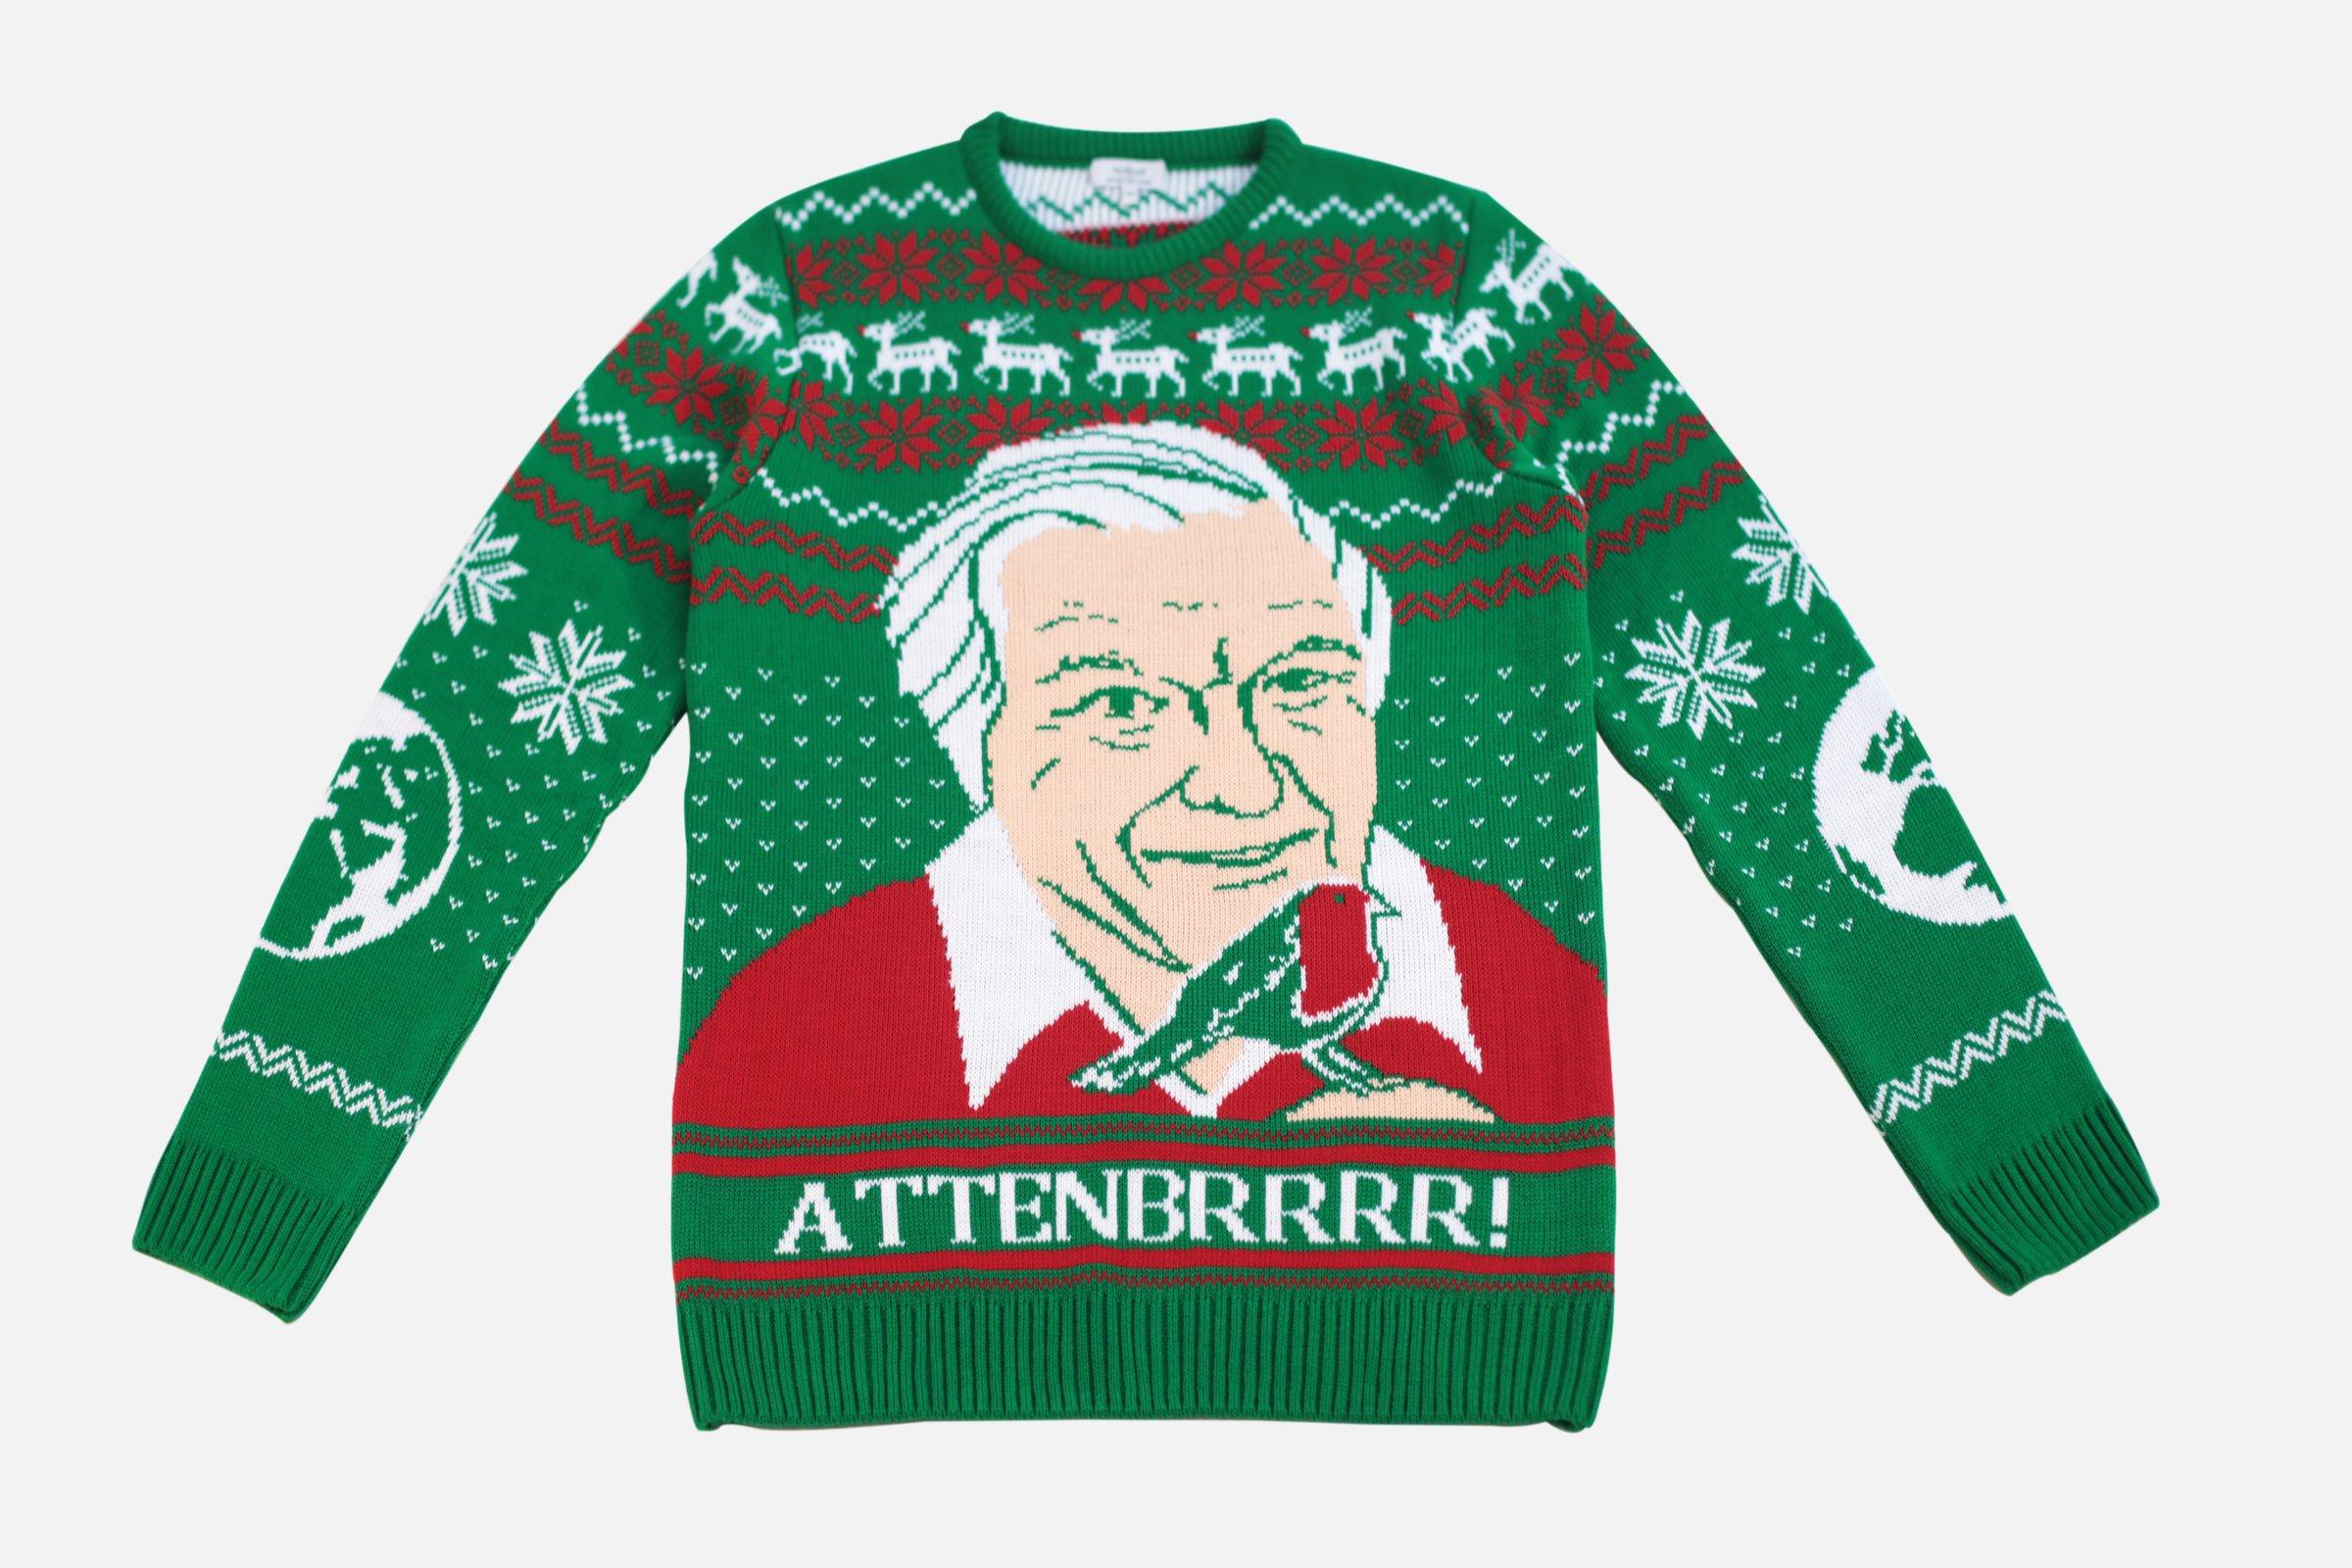 NotJust Attenborough Christmas Jumper